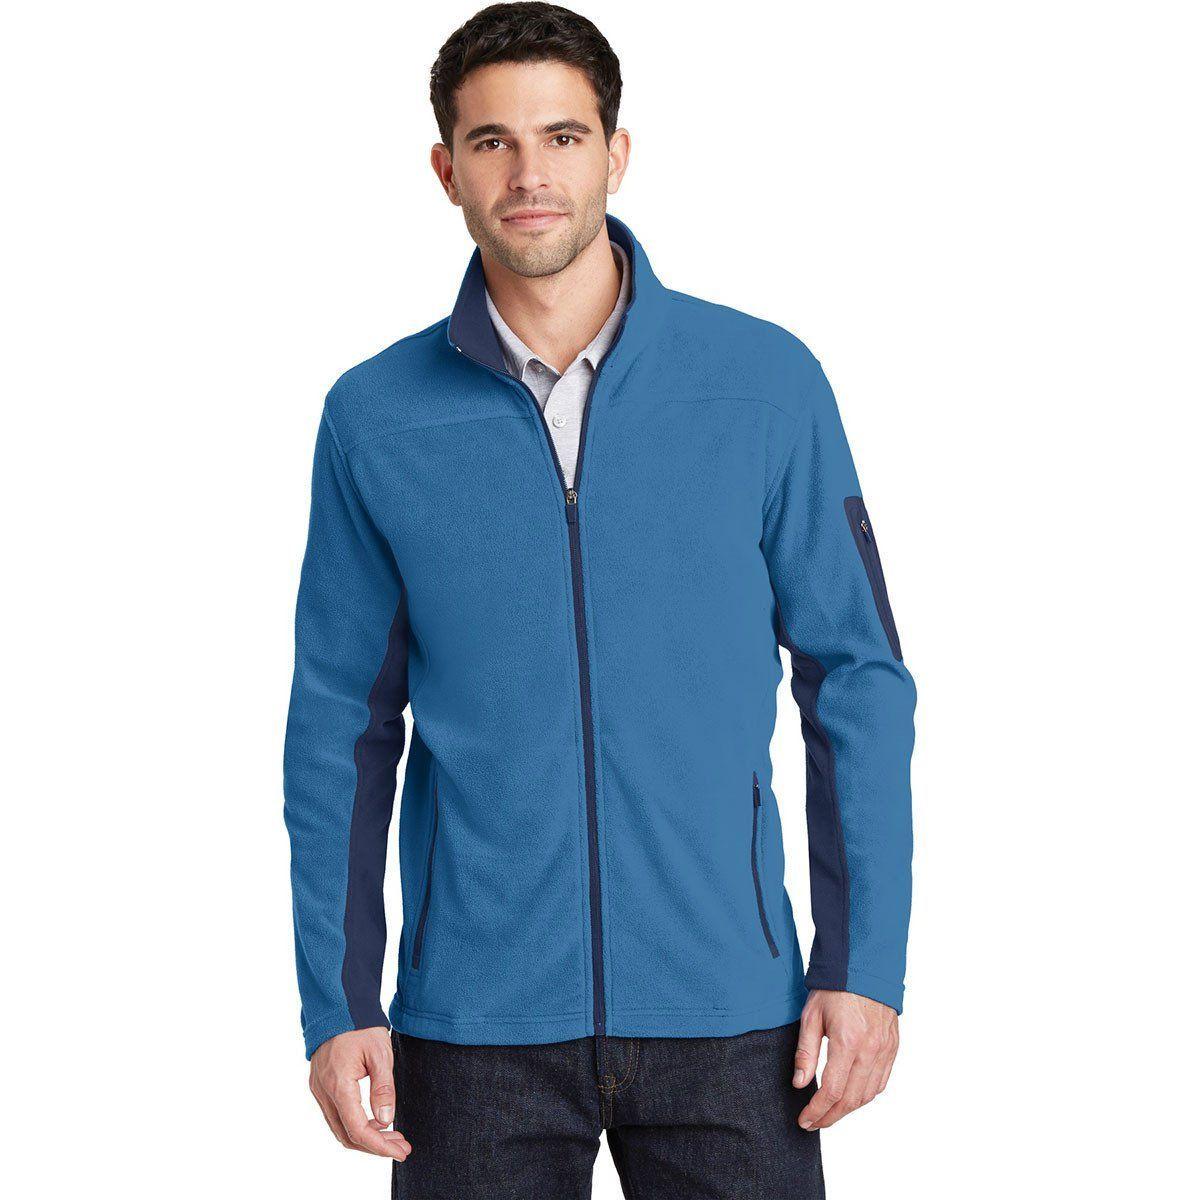 Port Authority Men's Regal Blue/Dress Blue Navy Summit Fleece Full-Zip Jacket